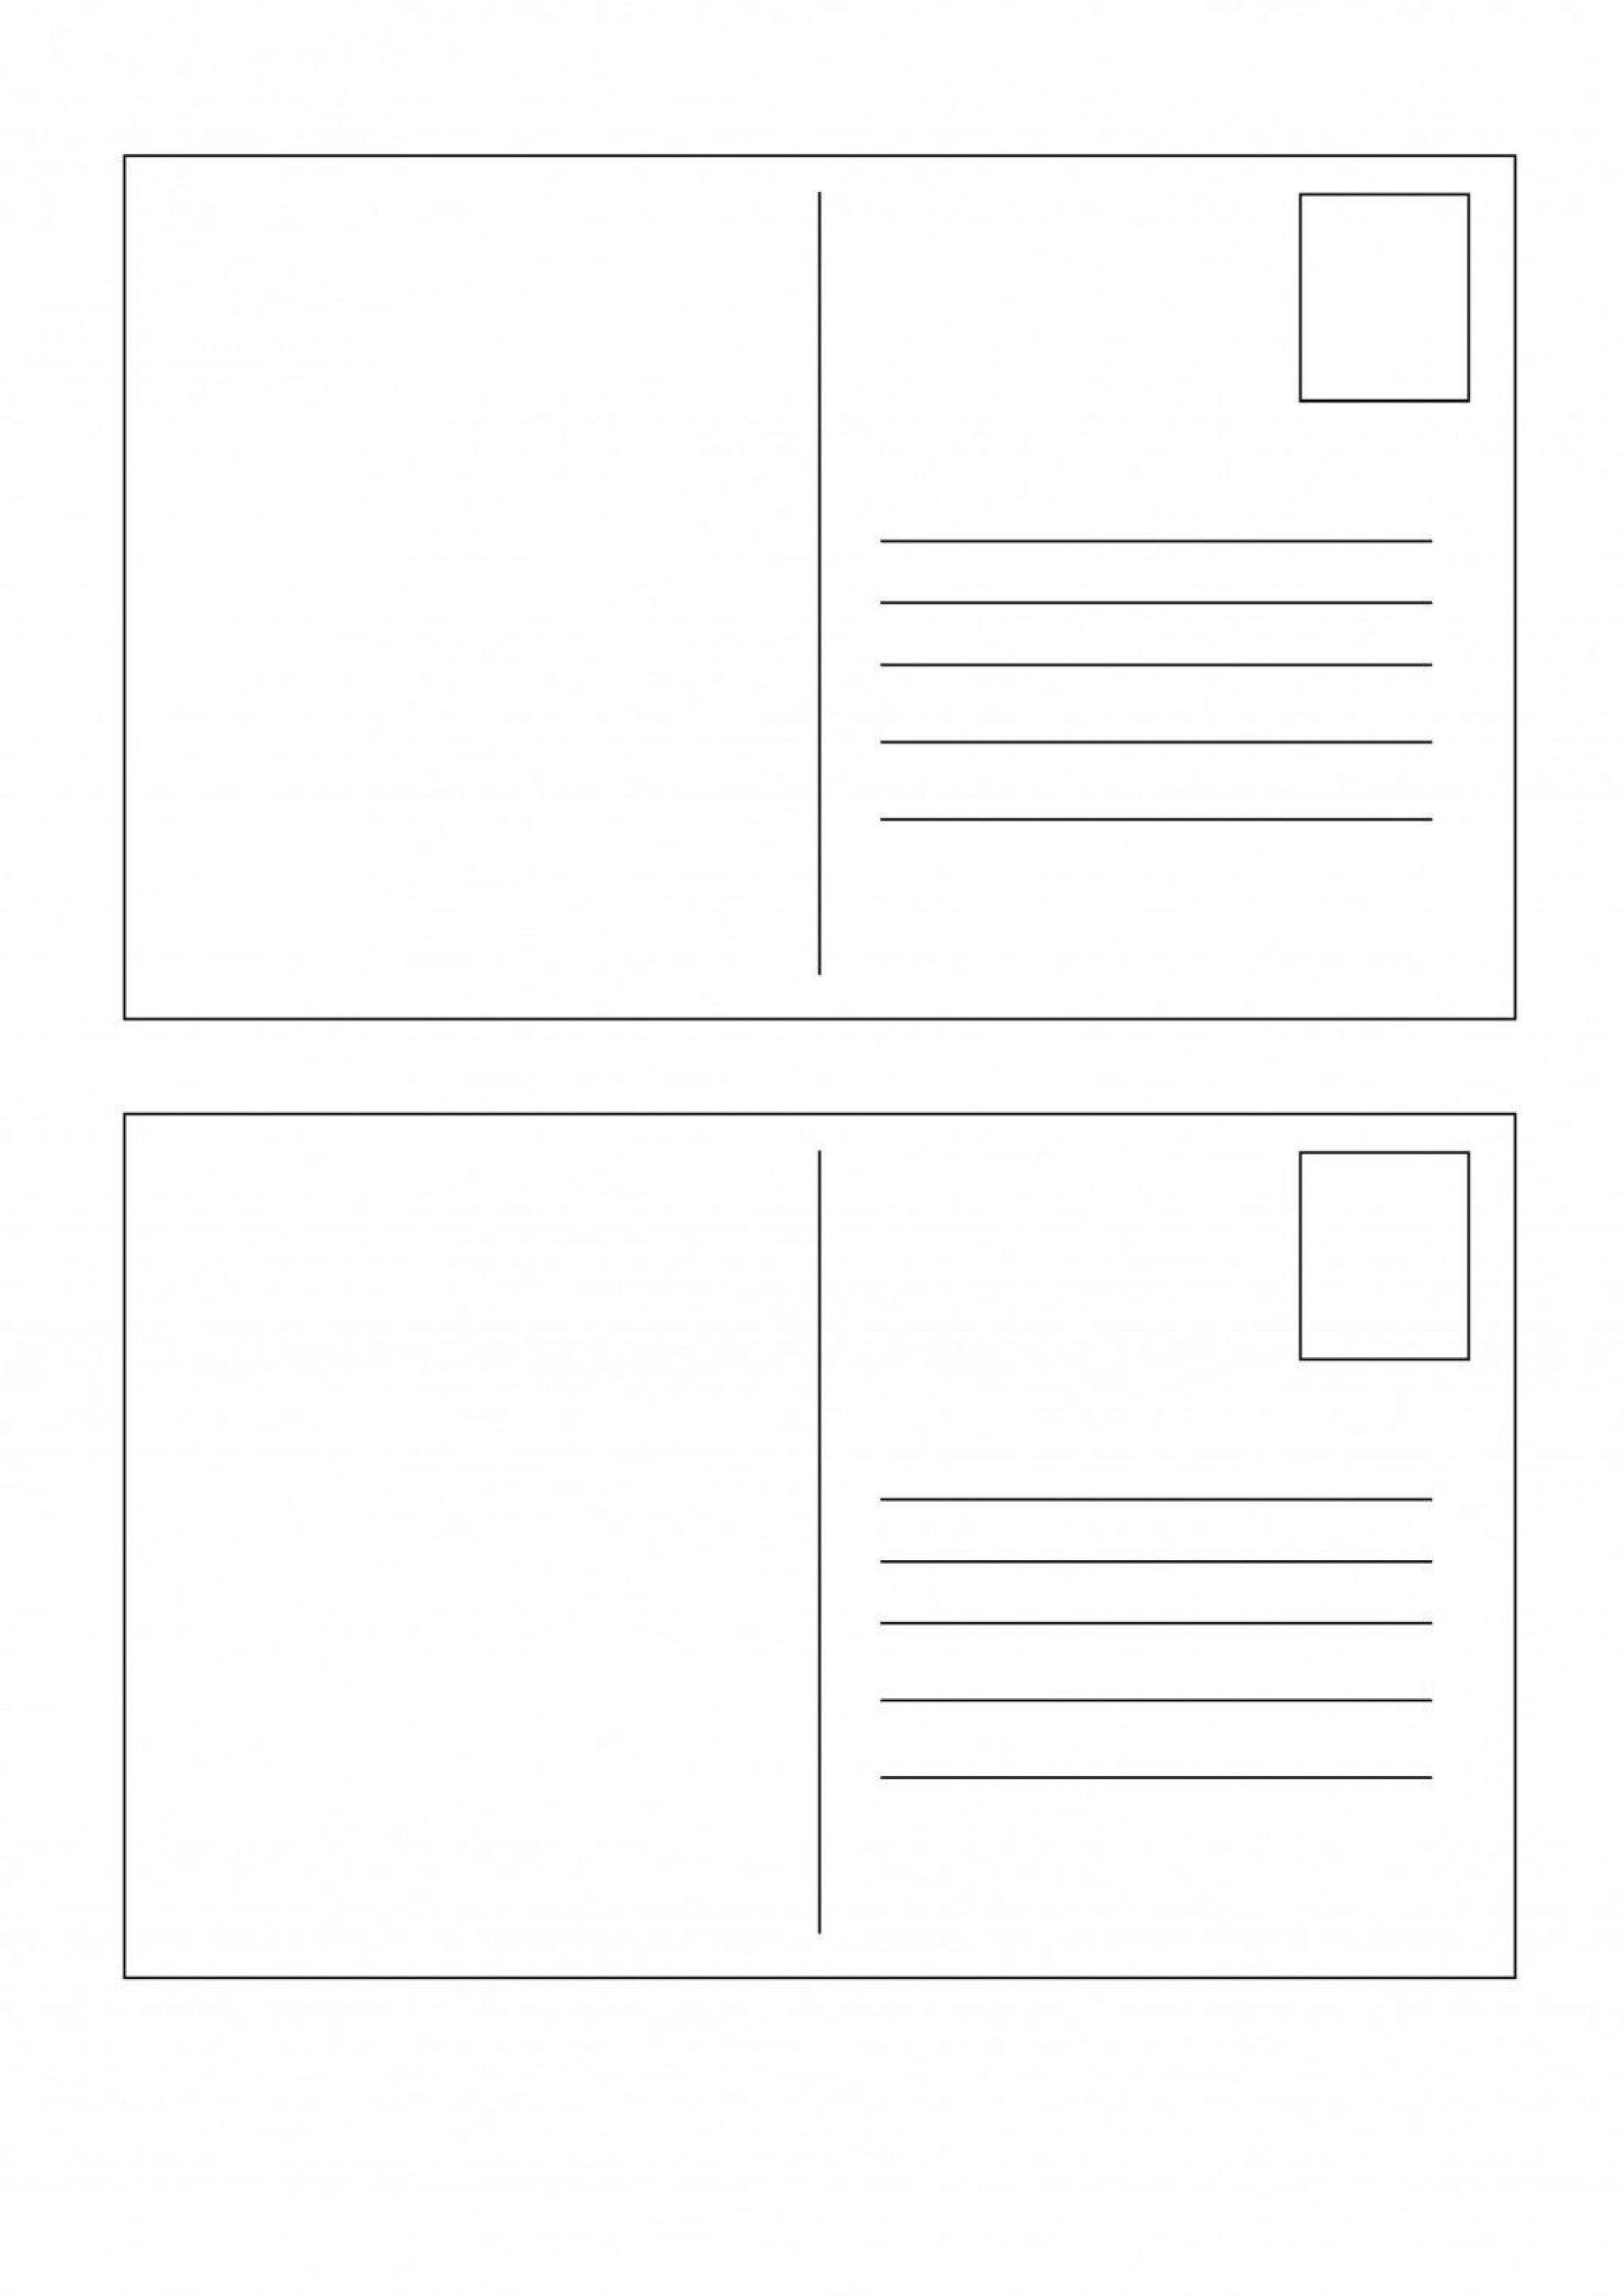 010 Imposing 5 X 7 Postcard Template Microsoft Word Idea Full